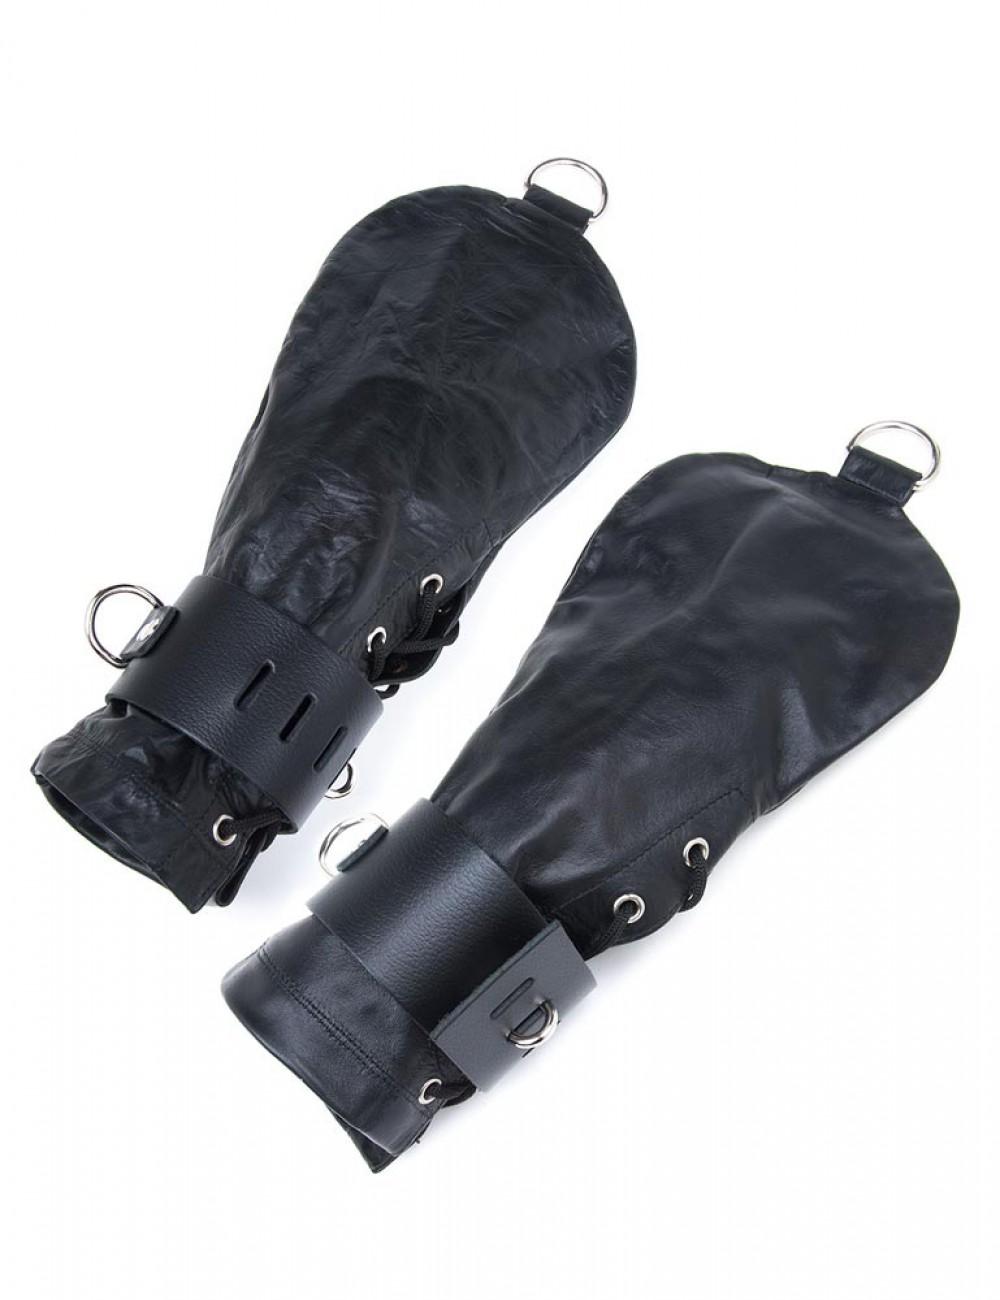 Bondage Mittens, Black Leather